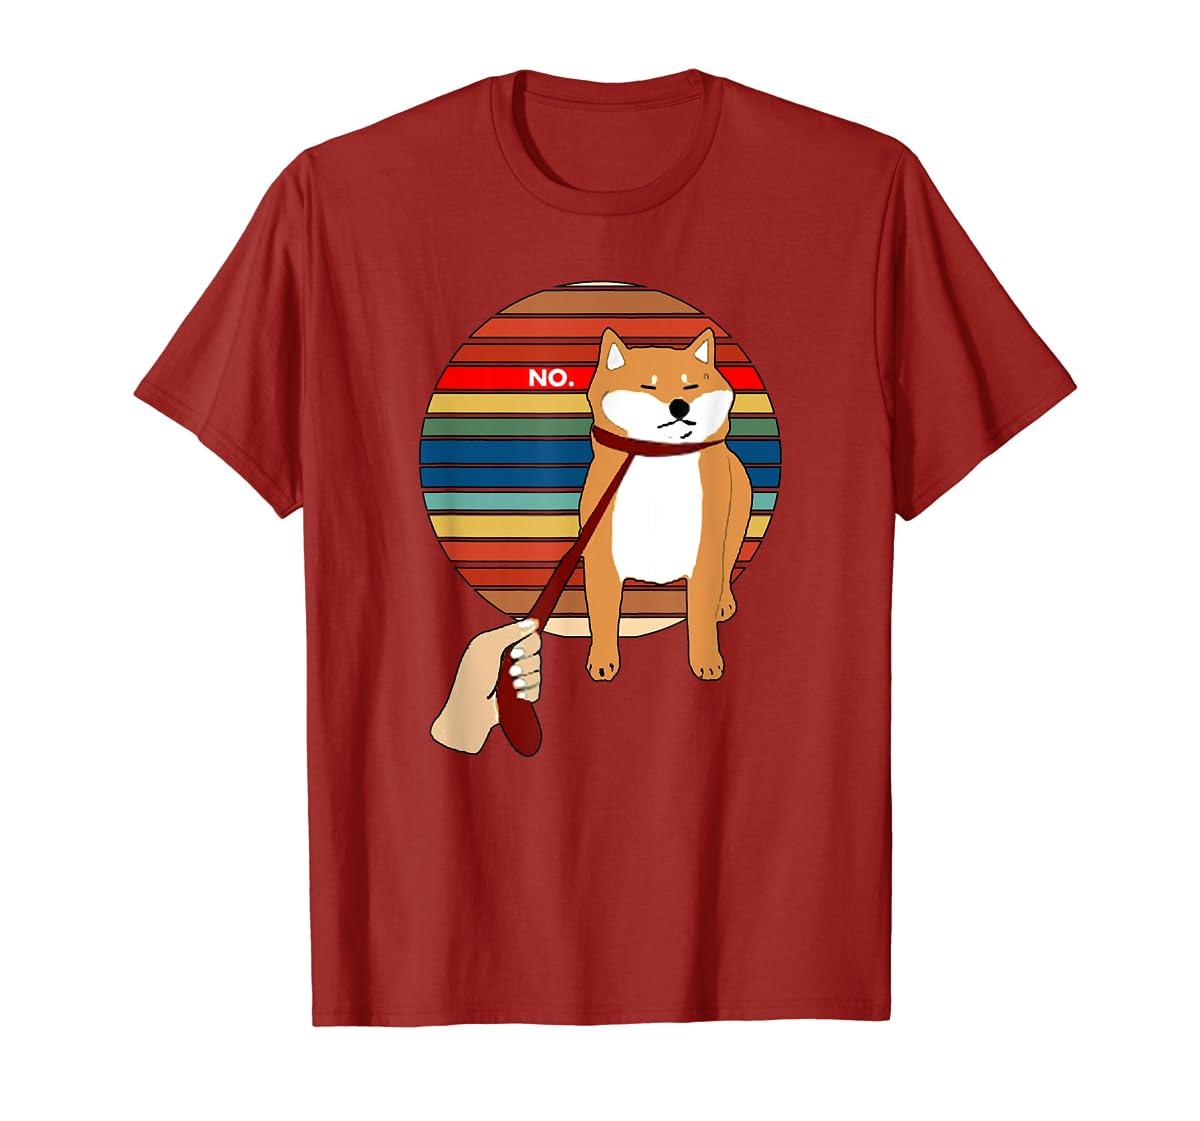 Cute Vintage Retro Shiba Inu Nope Dog Tee Shirt-Men's T-Shirt-Red